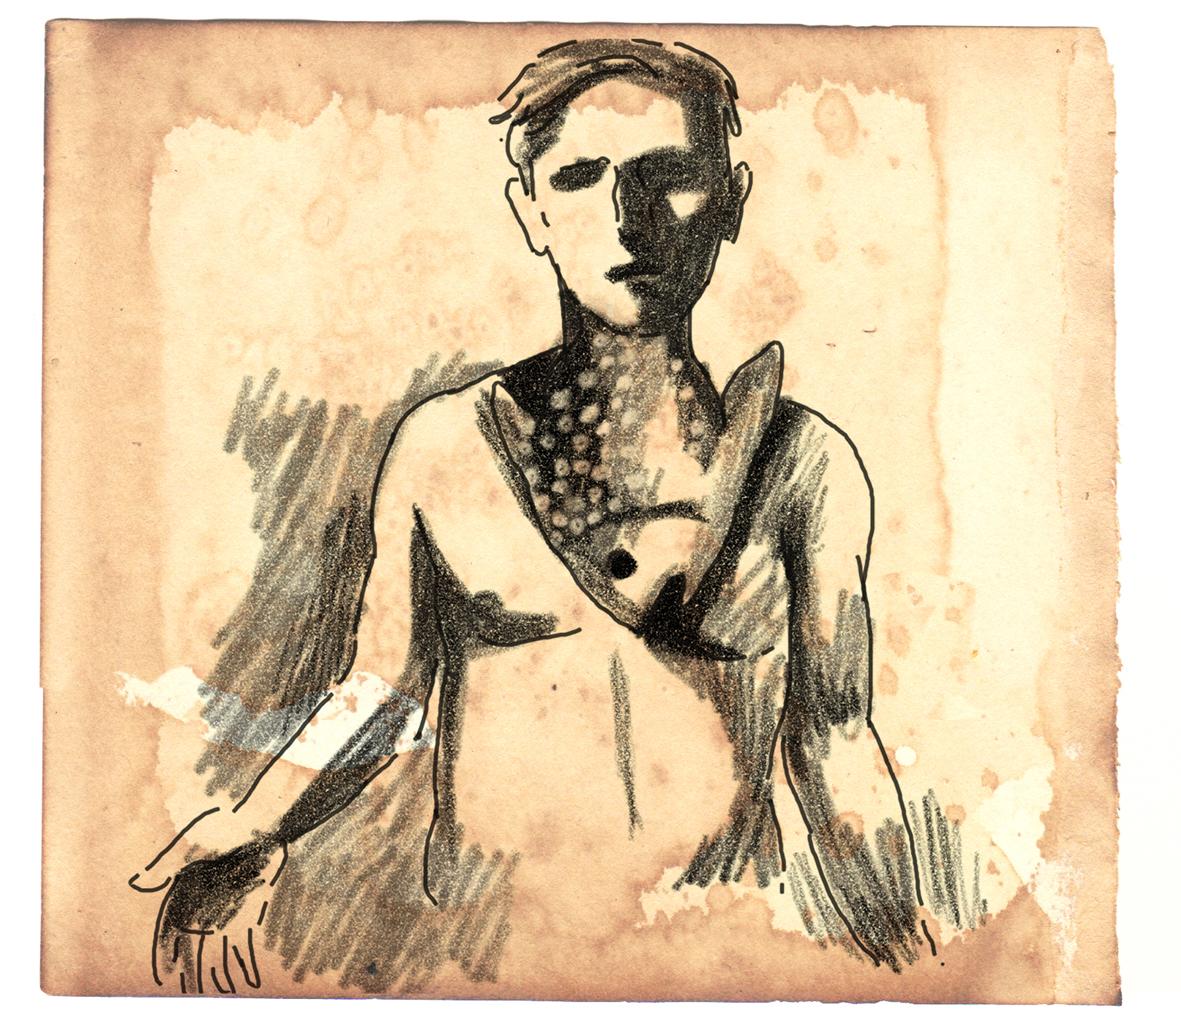 Art by Elahe Behin